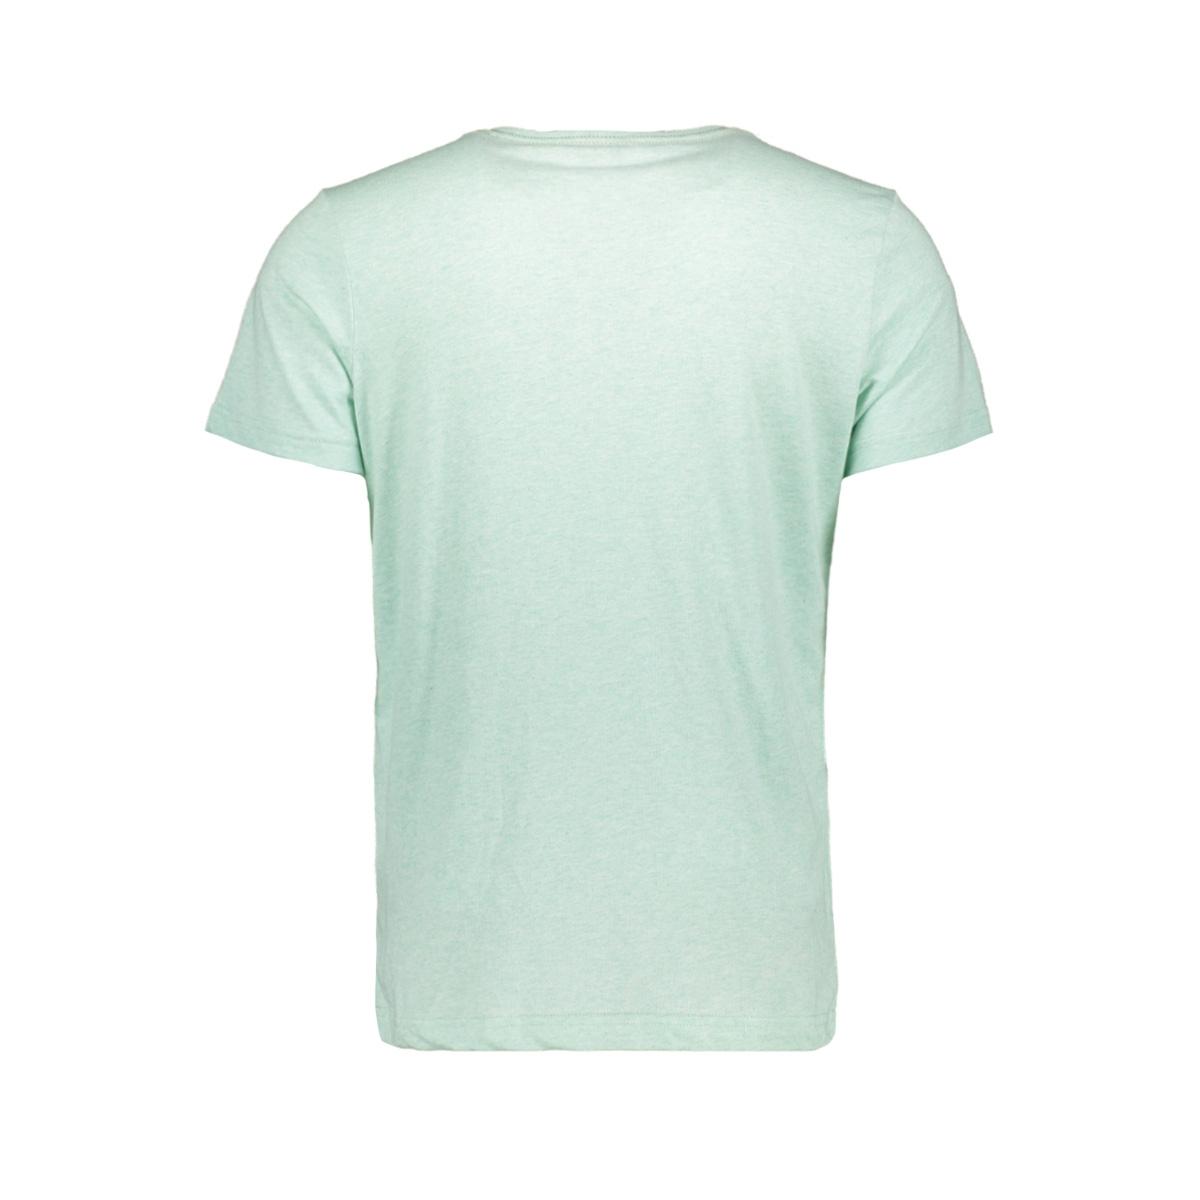 ptss191515 pme legend t-shirt 6174